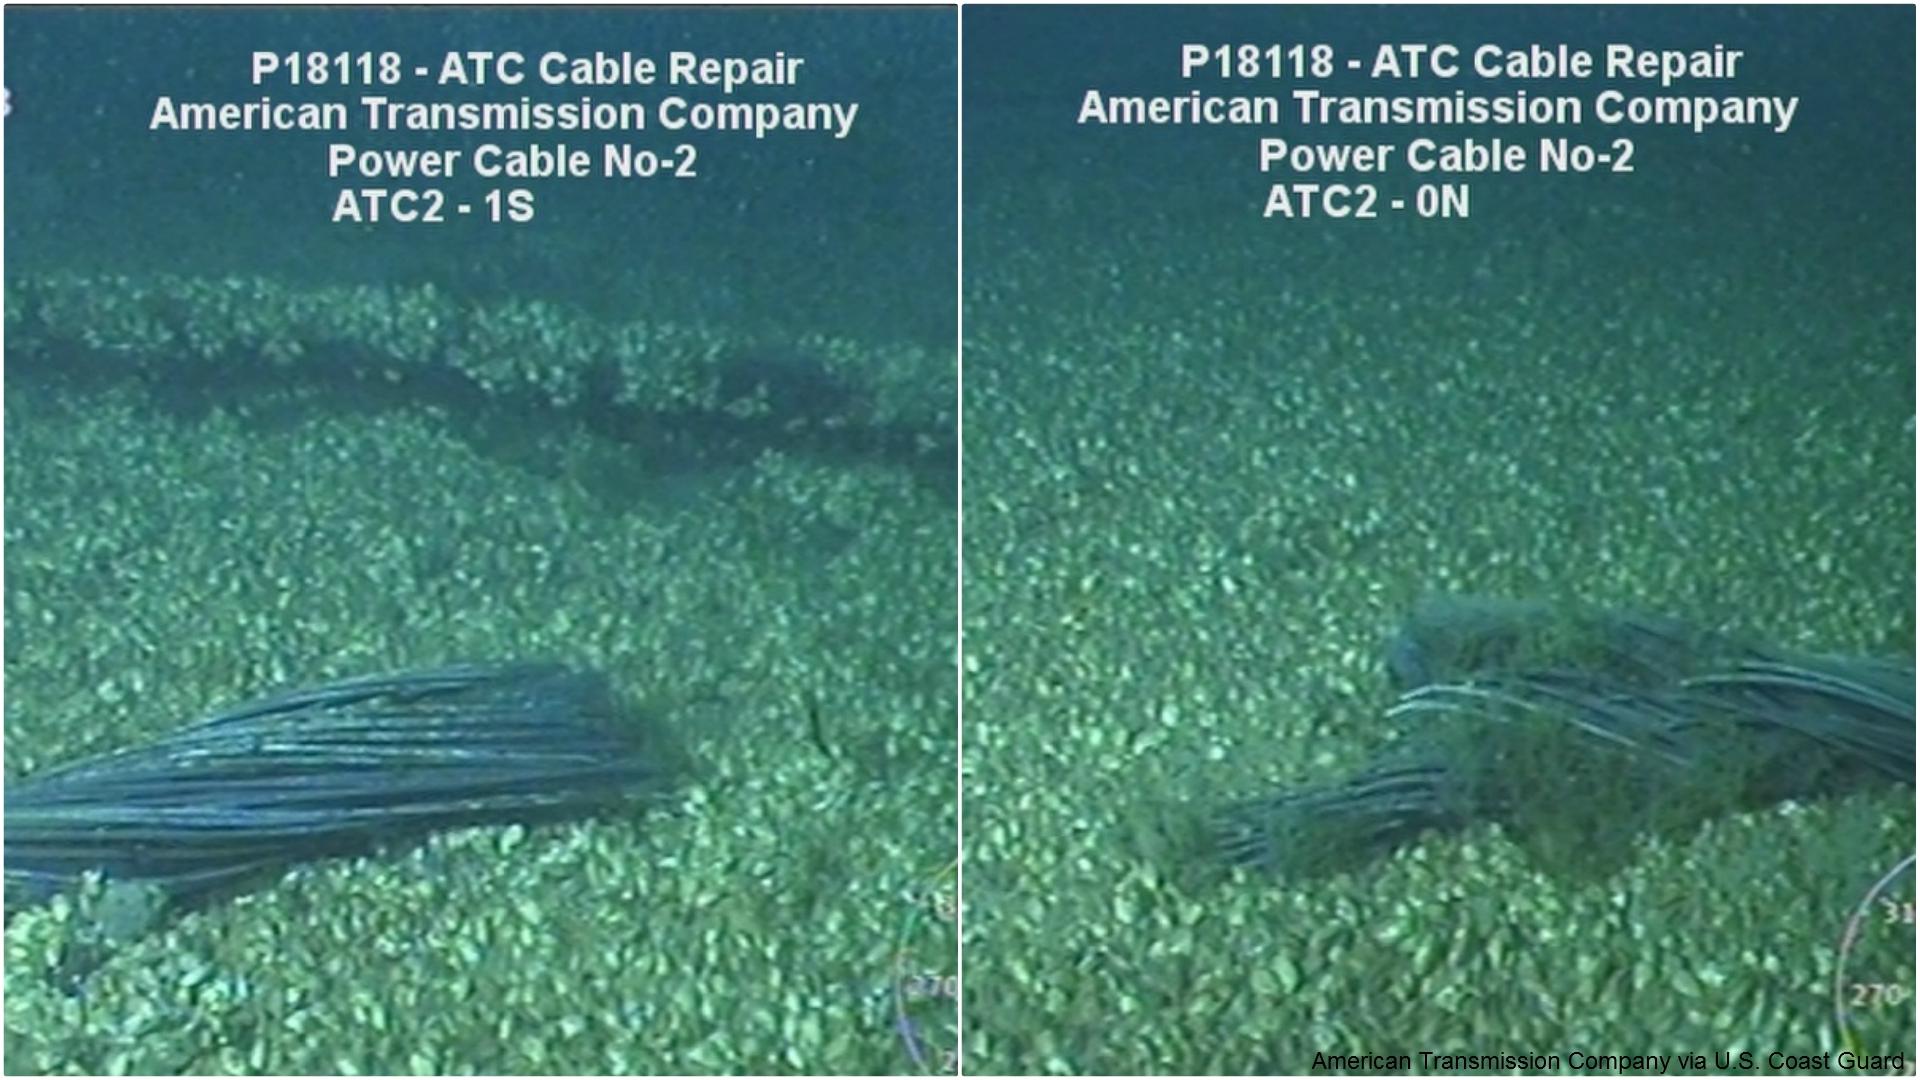 straits of mackinac underwater cables photos 042418_1524618553472.jpg.jpg